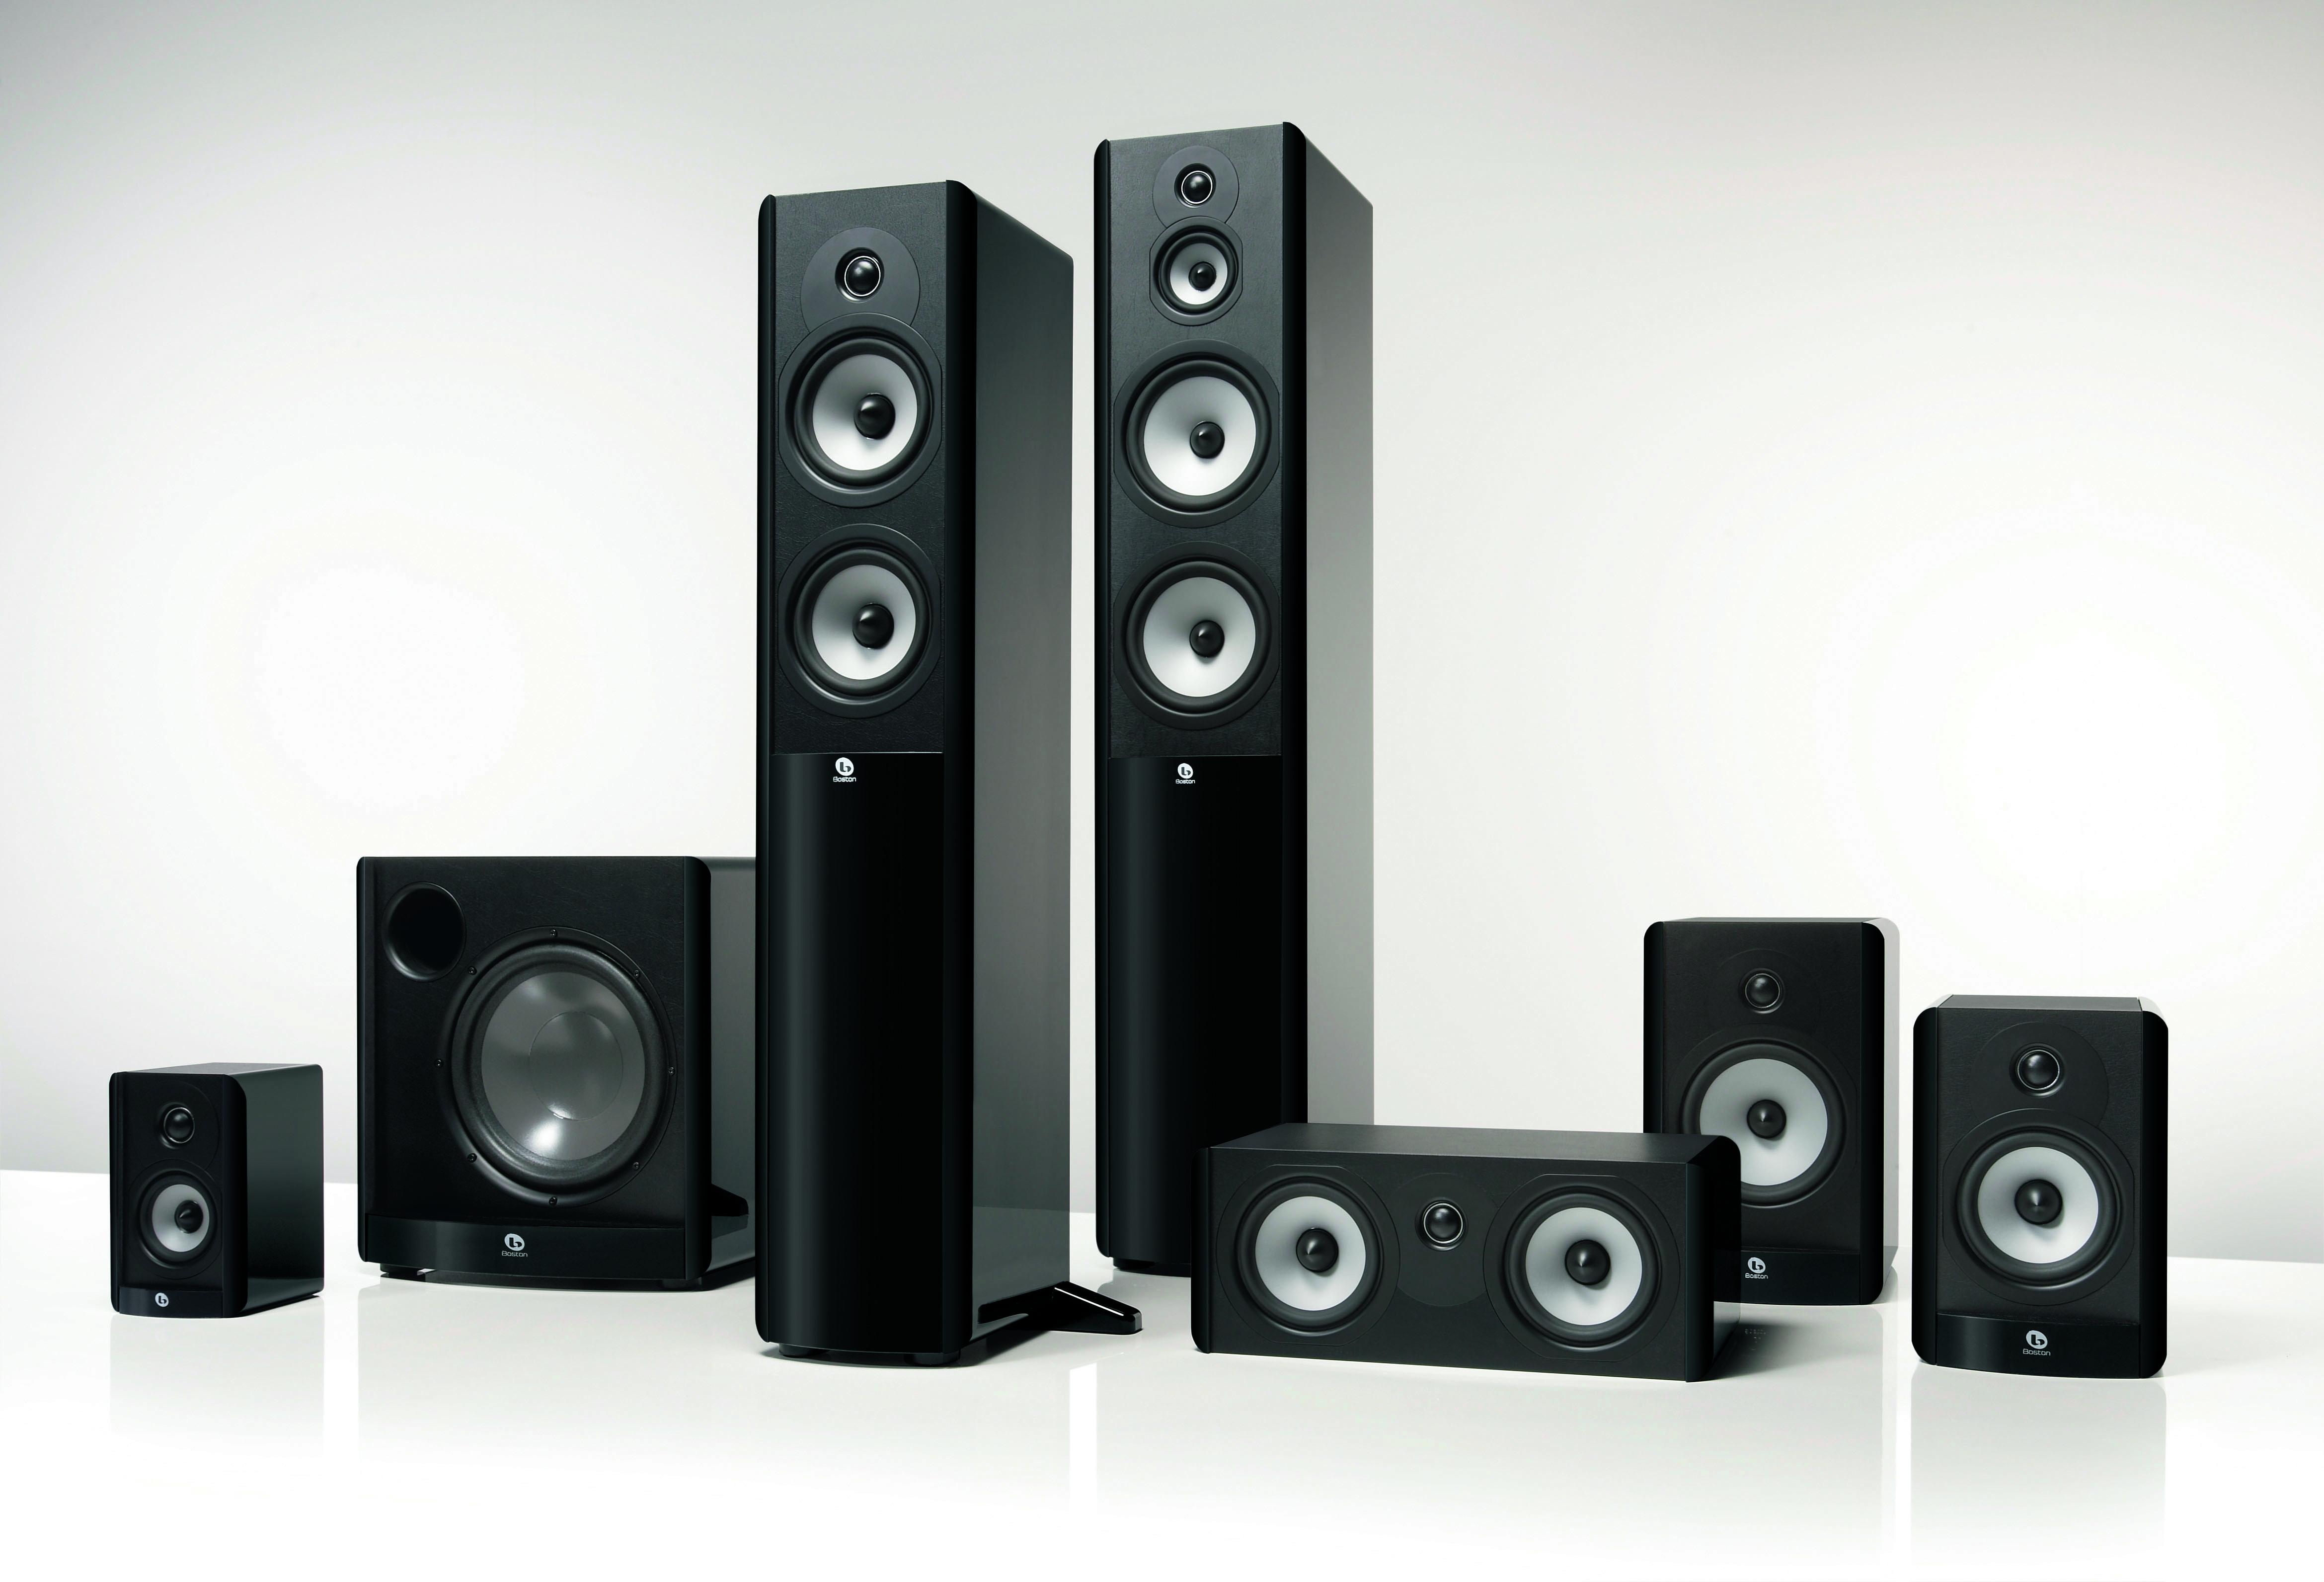 boston acoustics a series loudspeakers first look audioholics. Black Bedroom Furniture Sets. Home Design Ideas